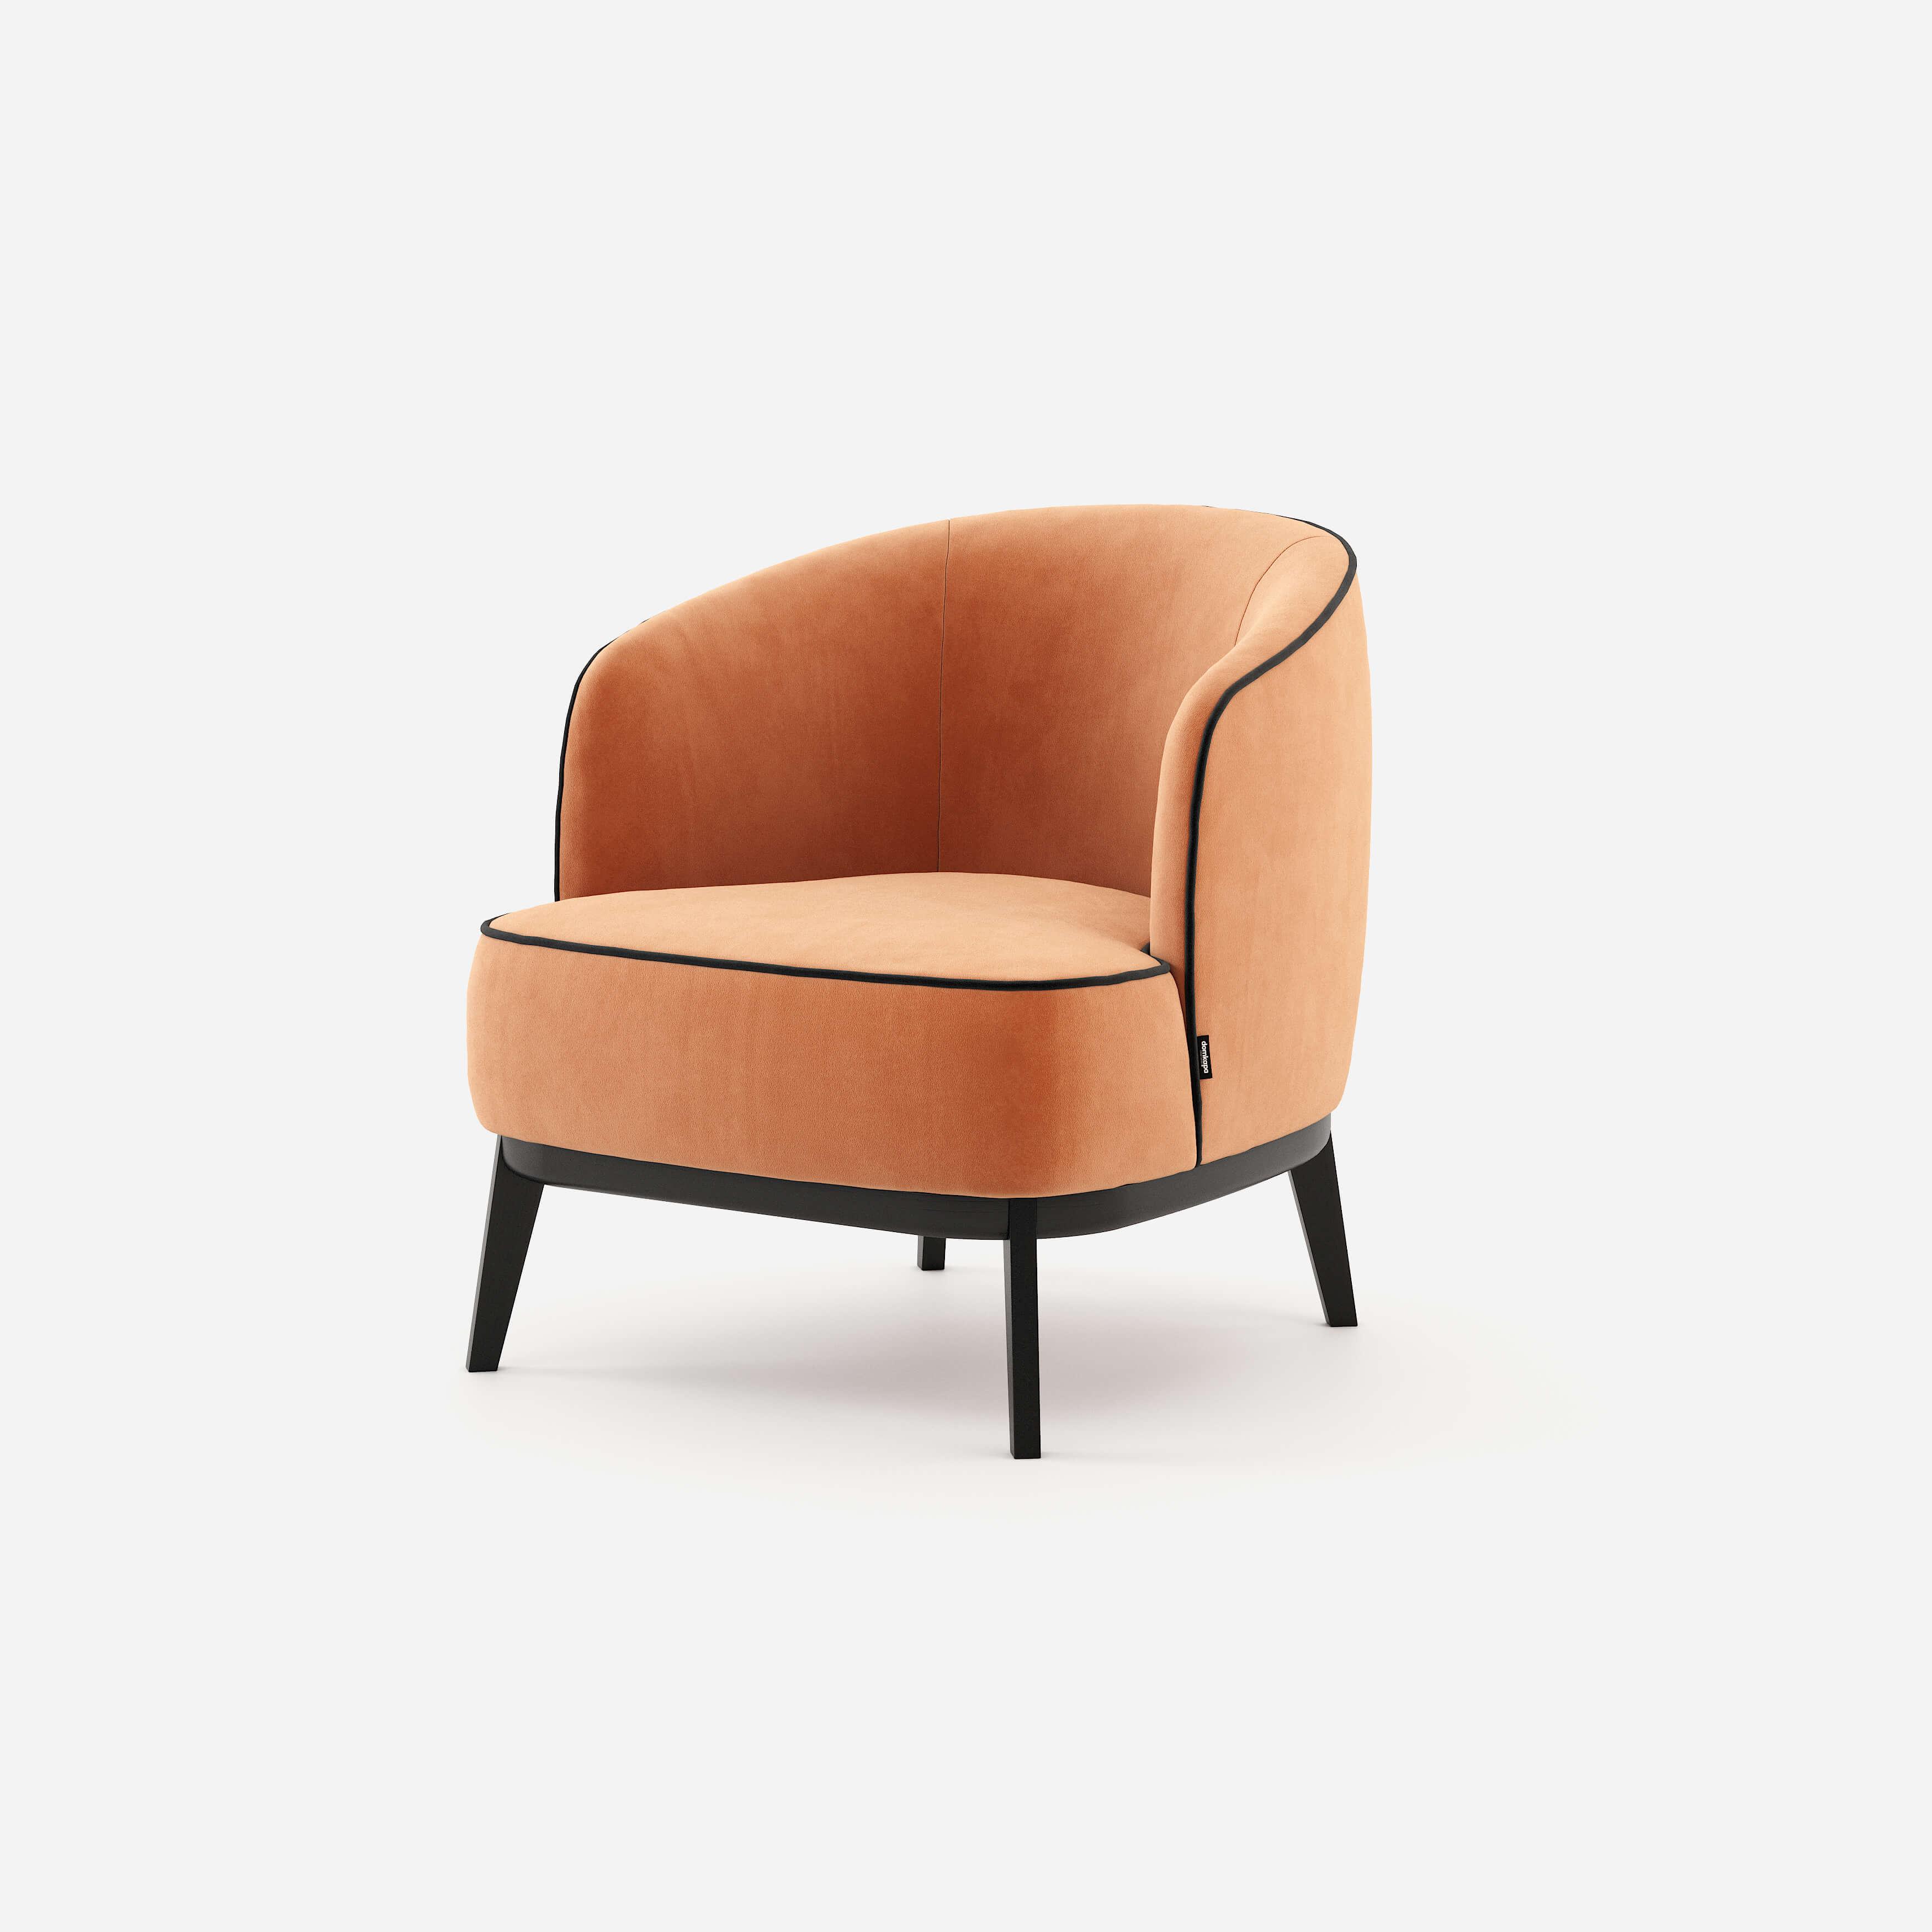 megan-armchair-maple-velvet-fabrics-upholstery-interior-design-ideas-inspirations-furniture-1